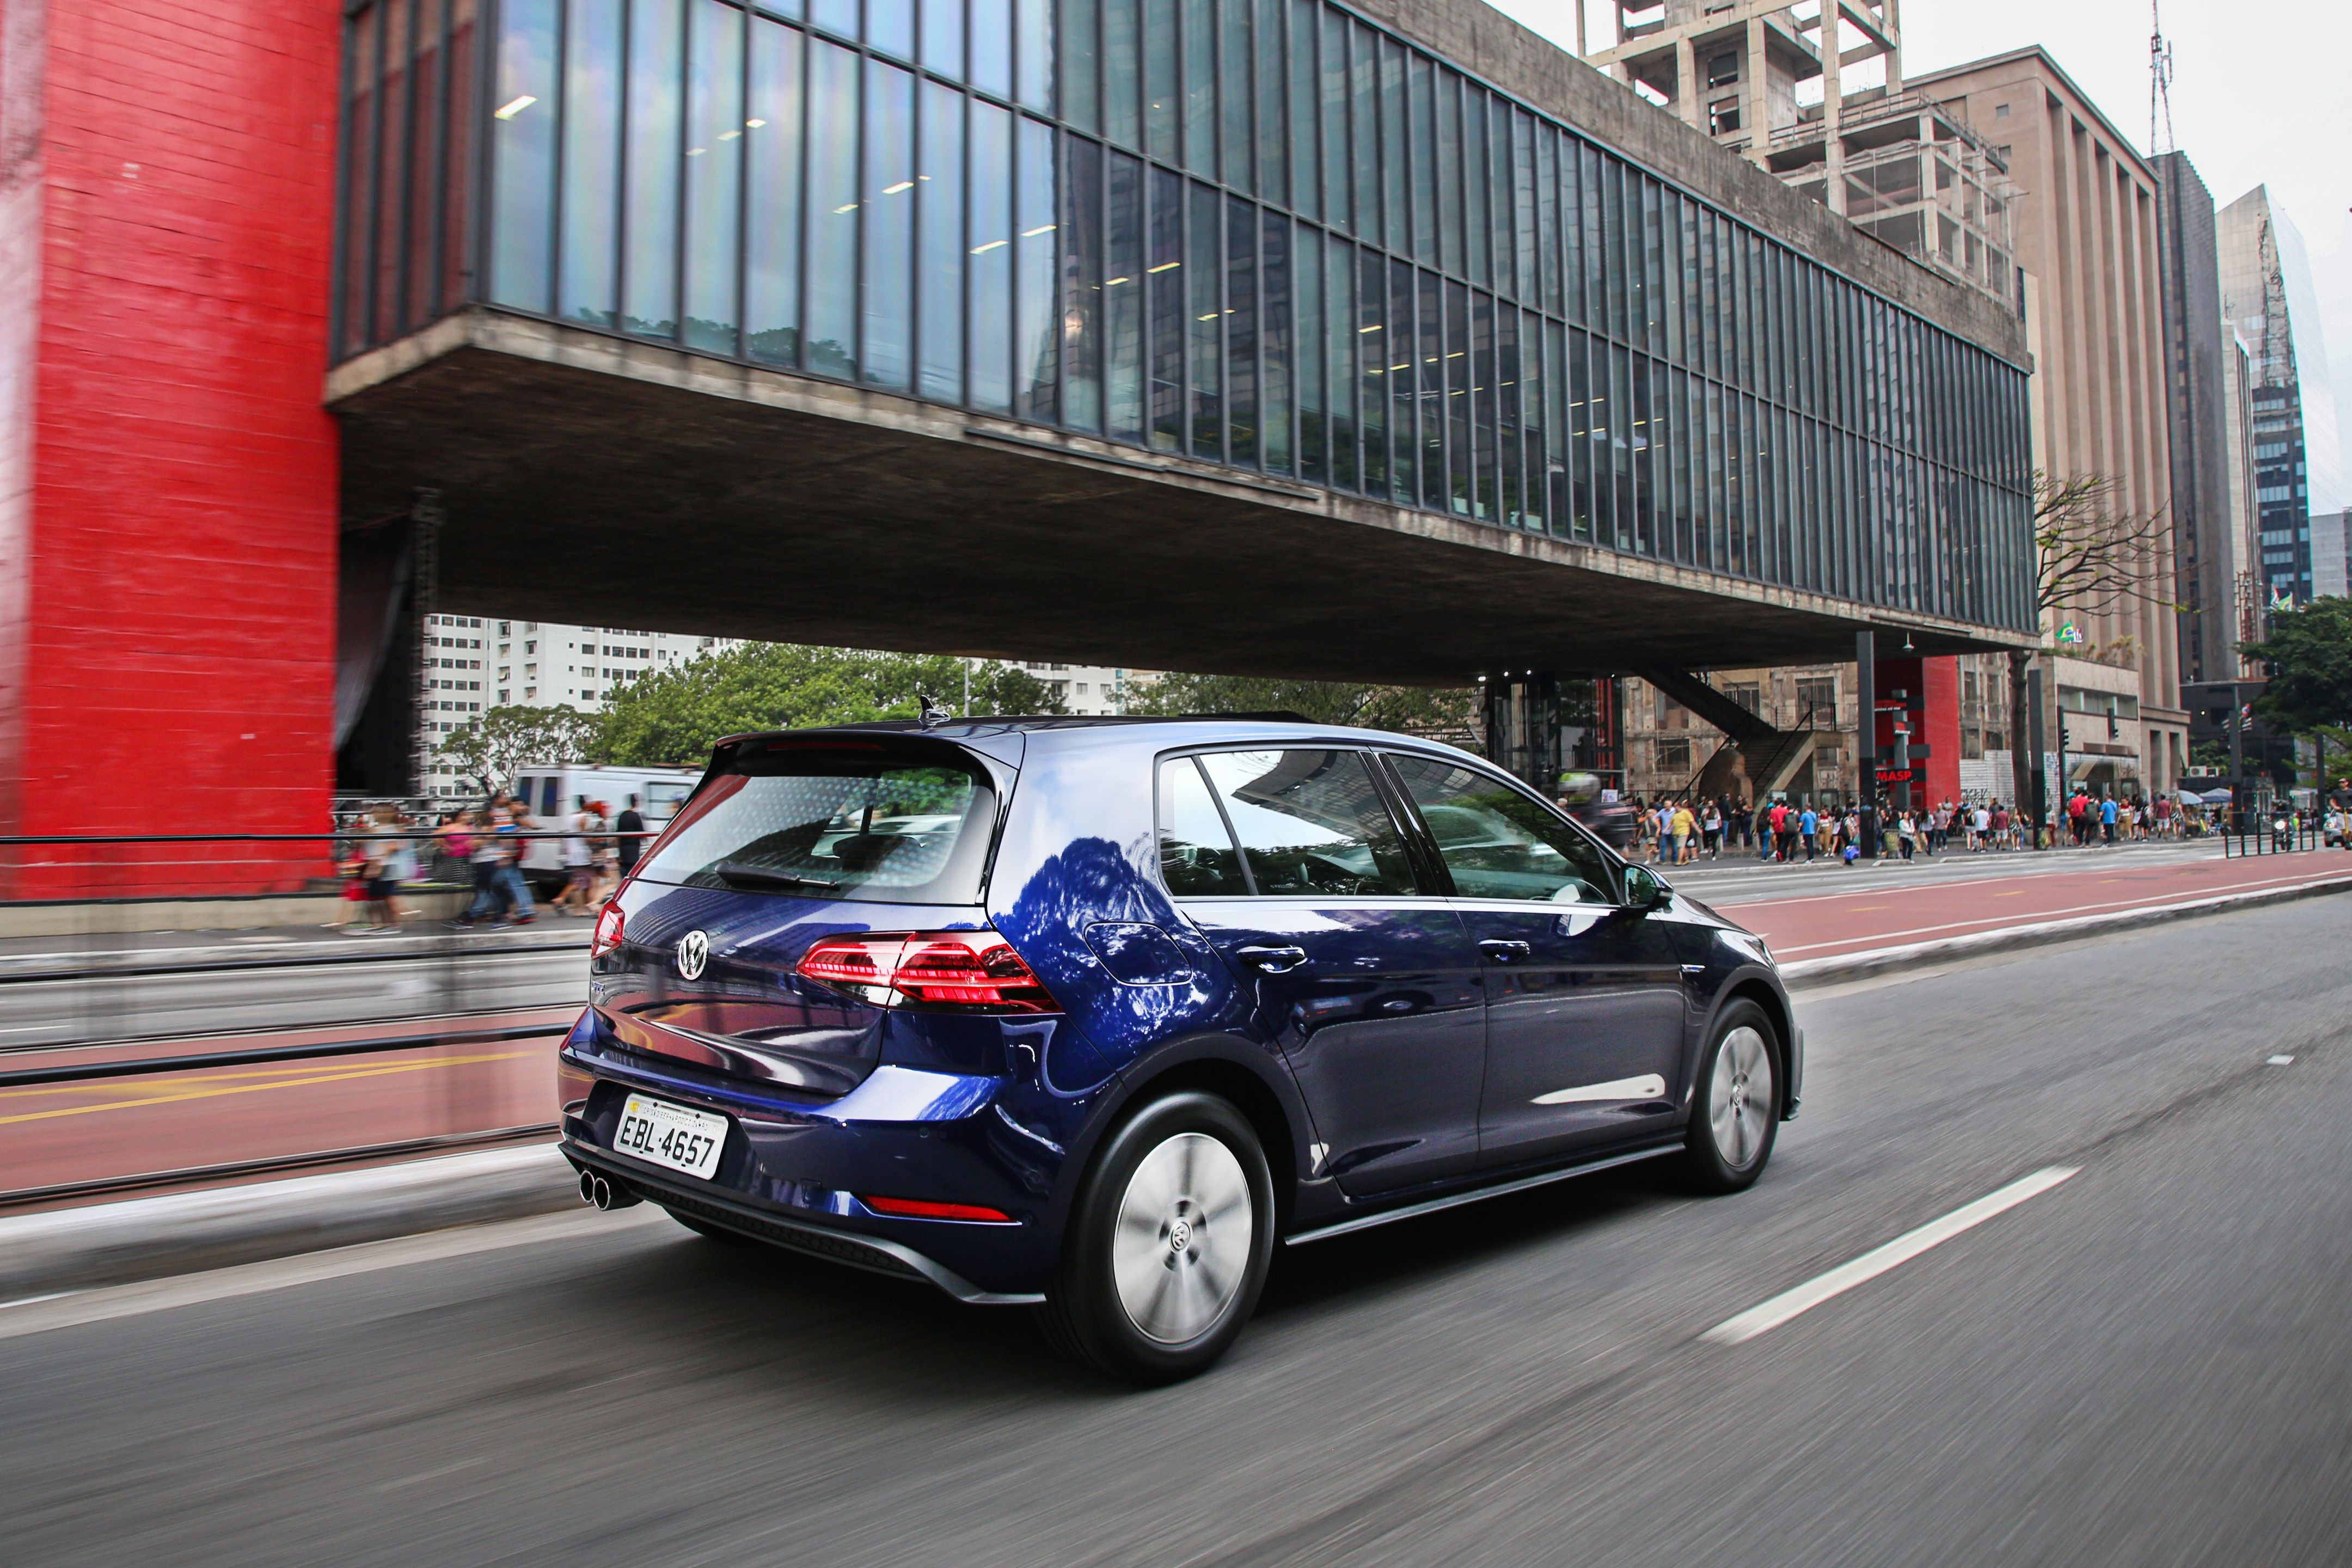 Engenheiro da Volkswagen roda 24 mil km pelo Brasil para testar pontos de recarga de carros híbridos e elétricos